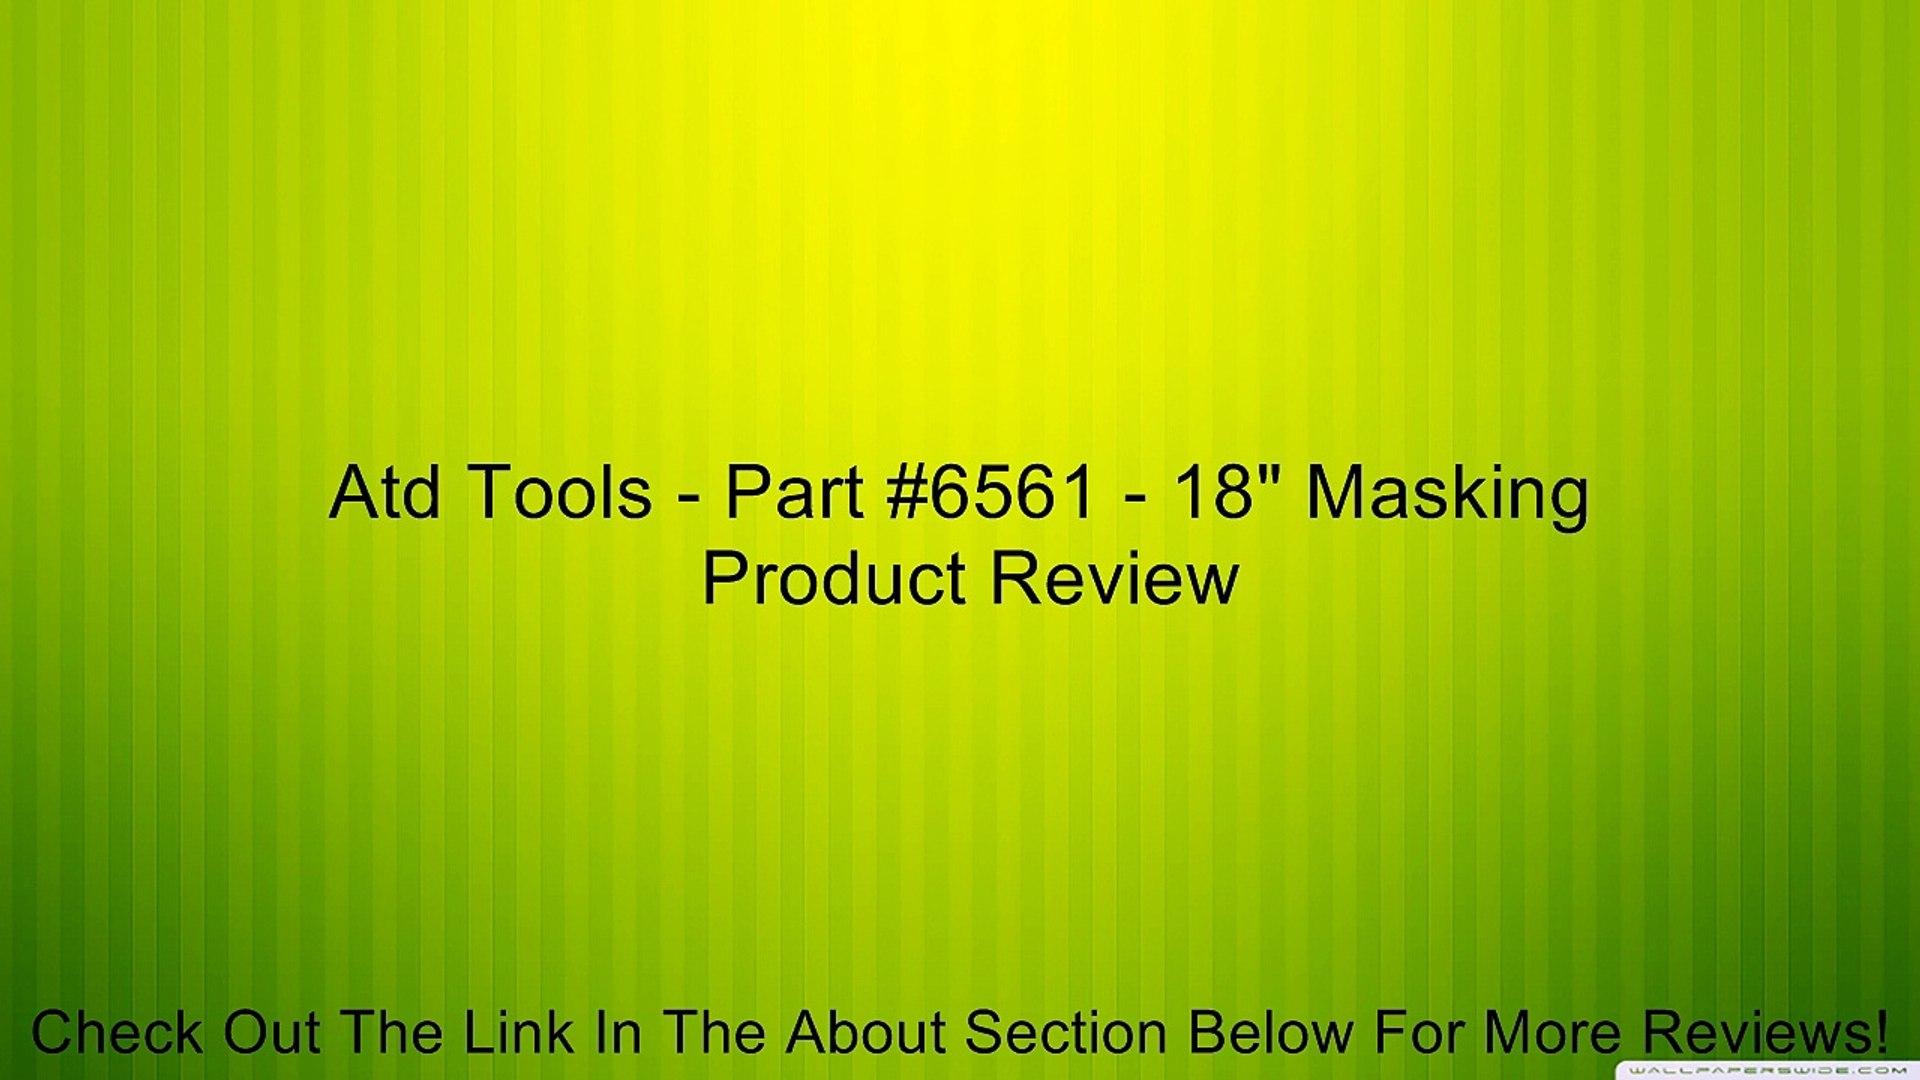 ATD Tools 6561 18 Masking Machine